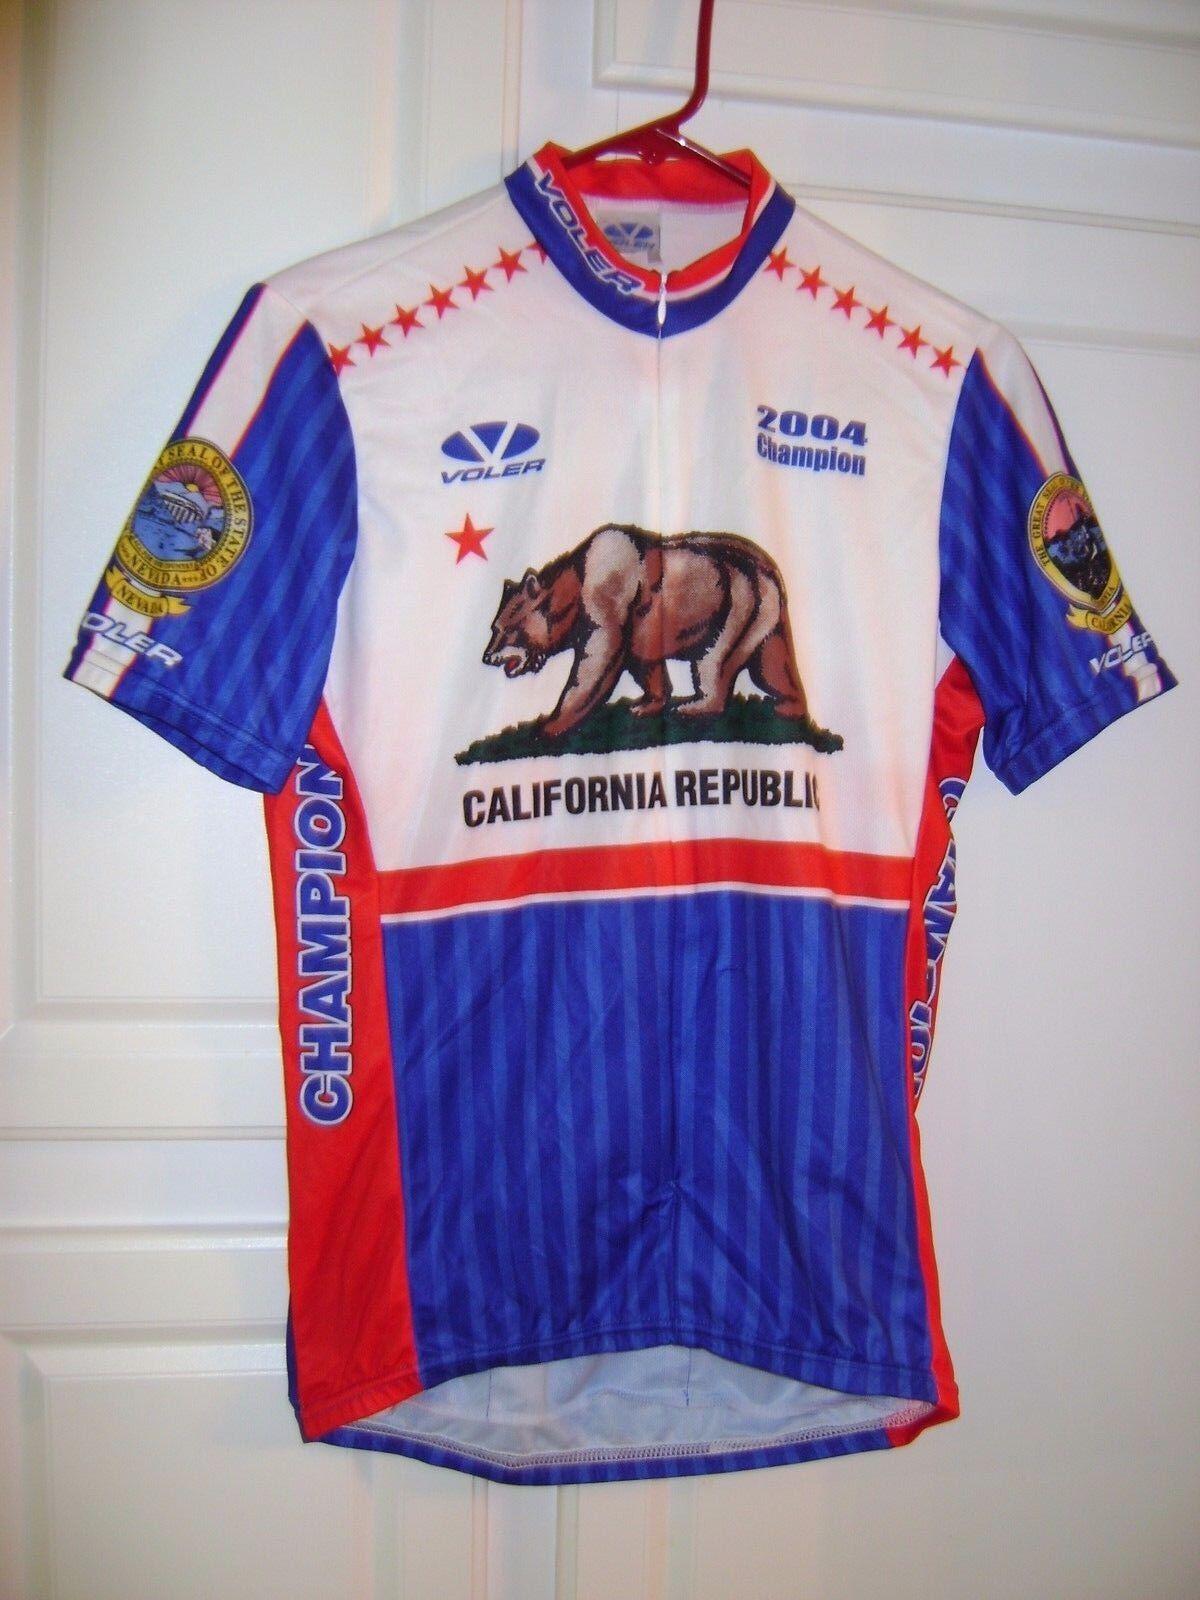 Voler Vintage Cycling JERSEY 2004 California State Champion Men's Medium